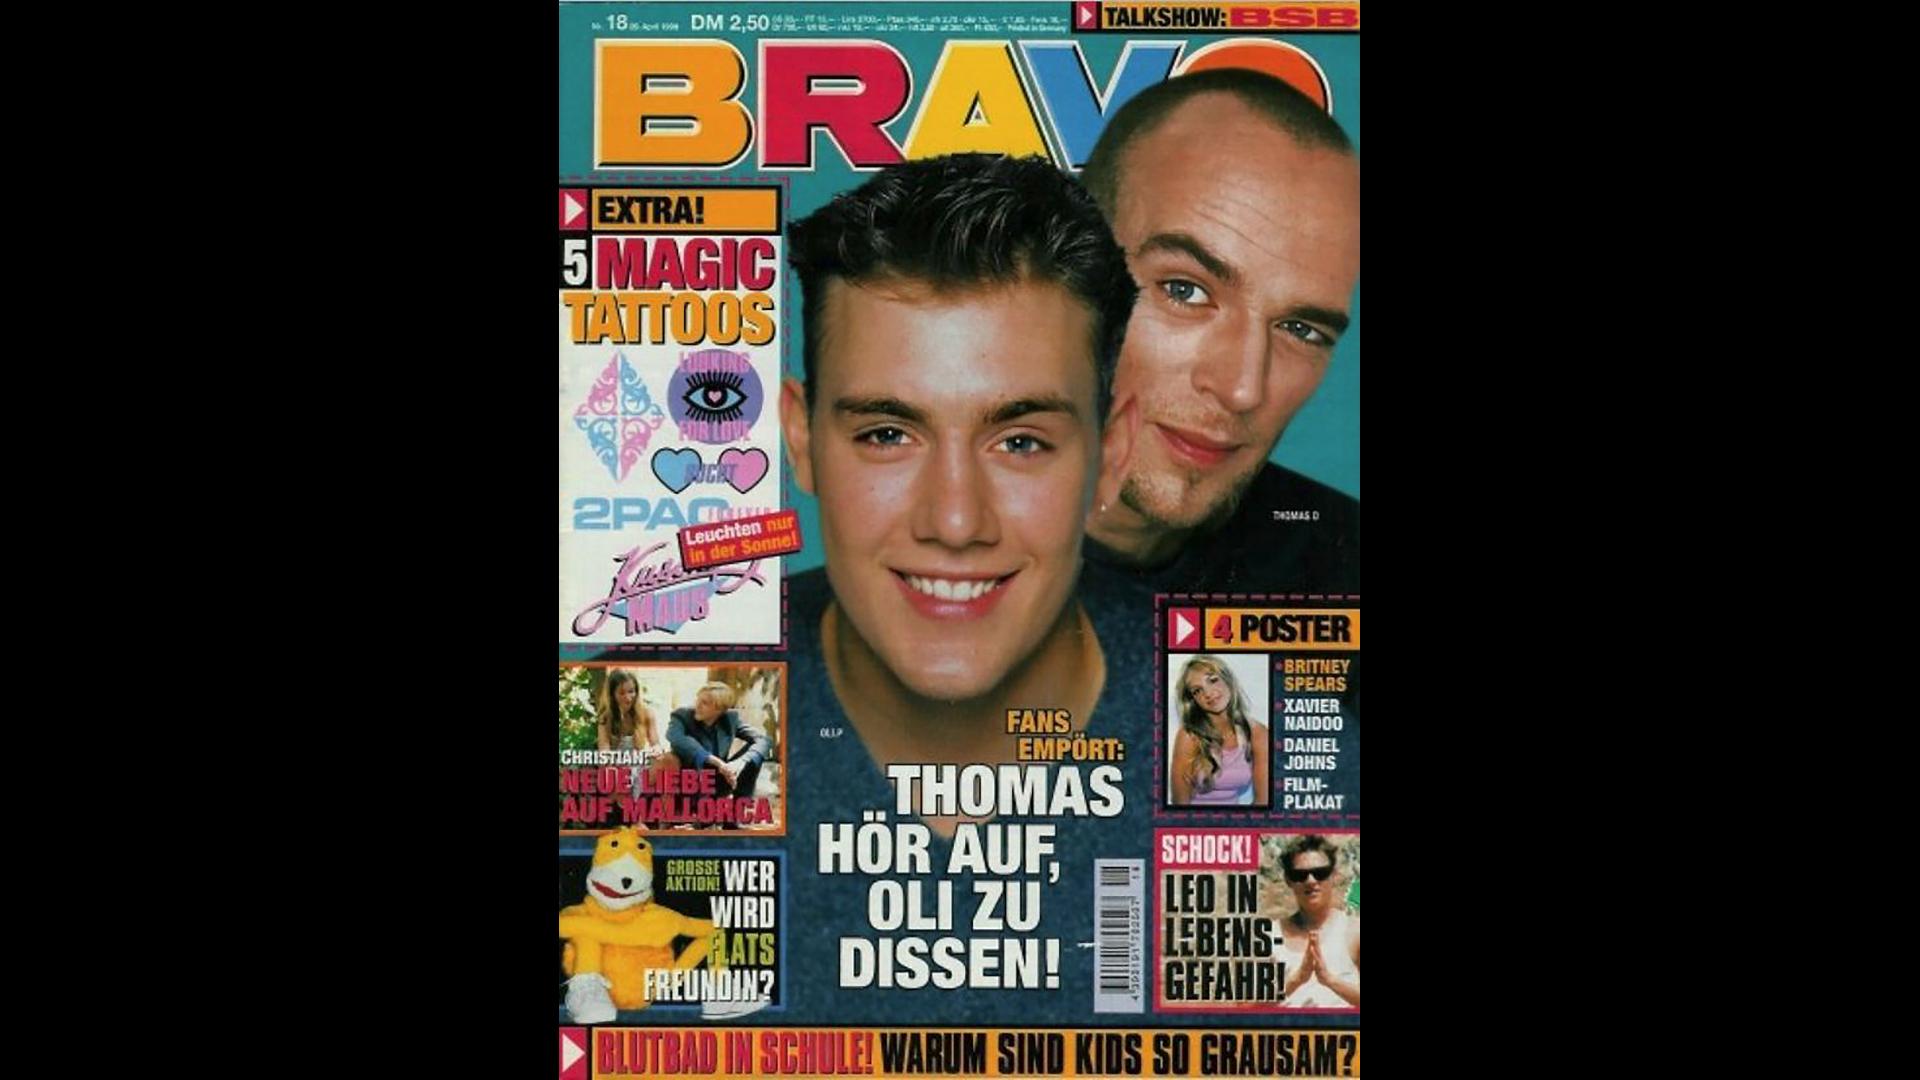 Bravo 18/99